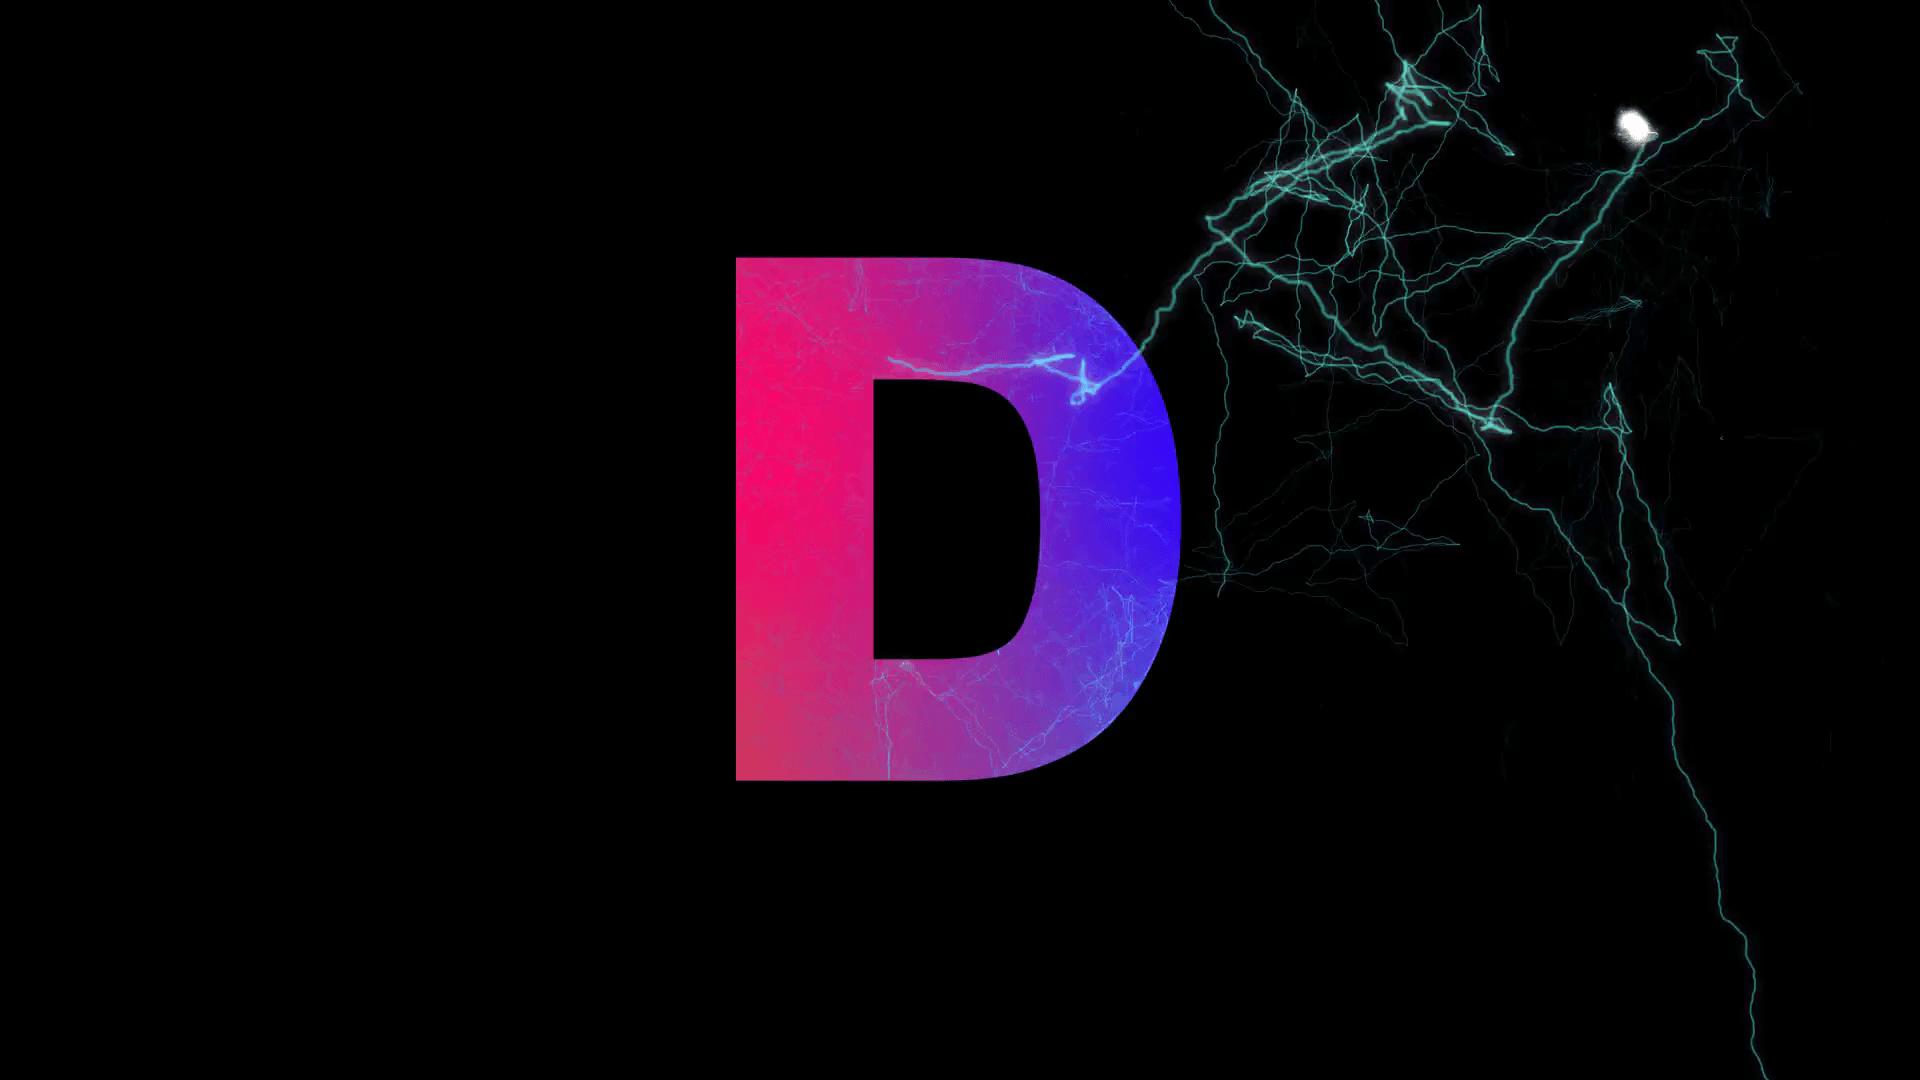 D Alphabet Wallpapers - Wallpaper Cave